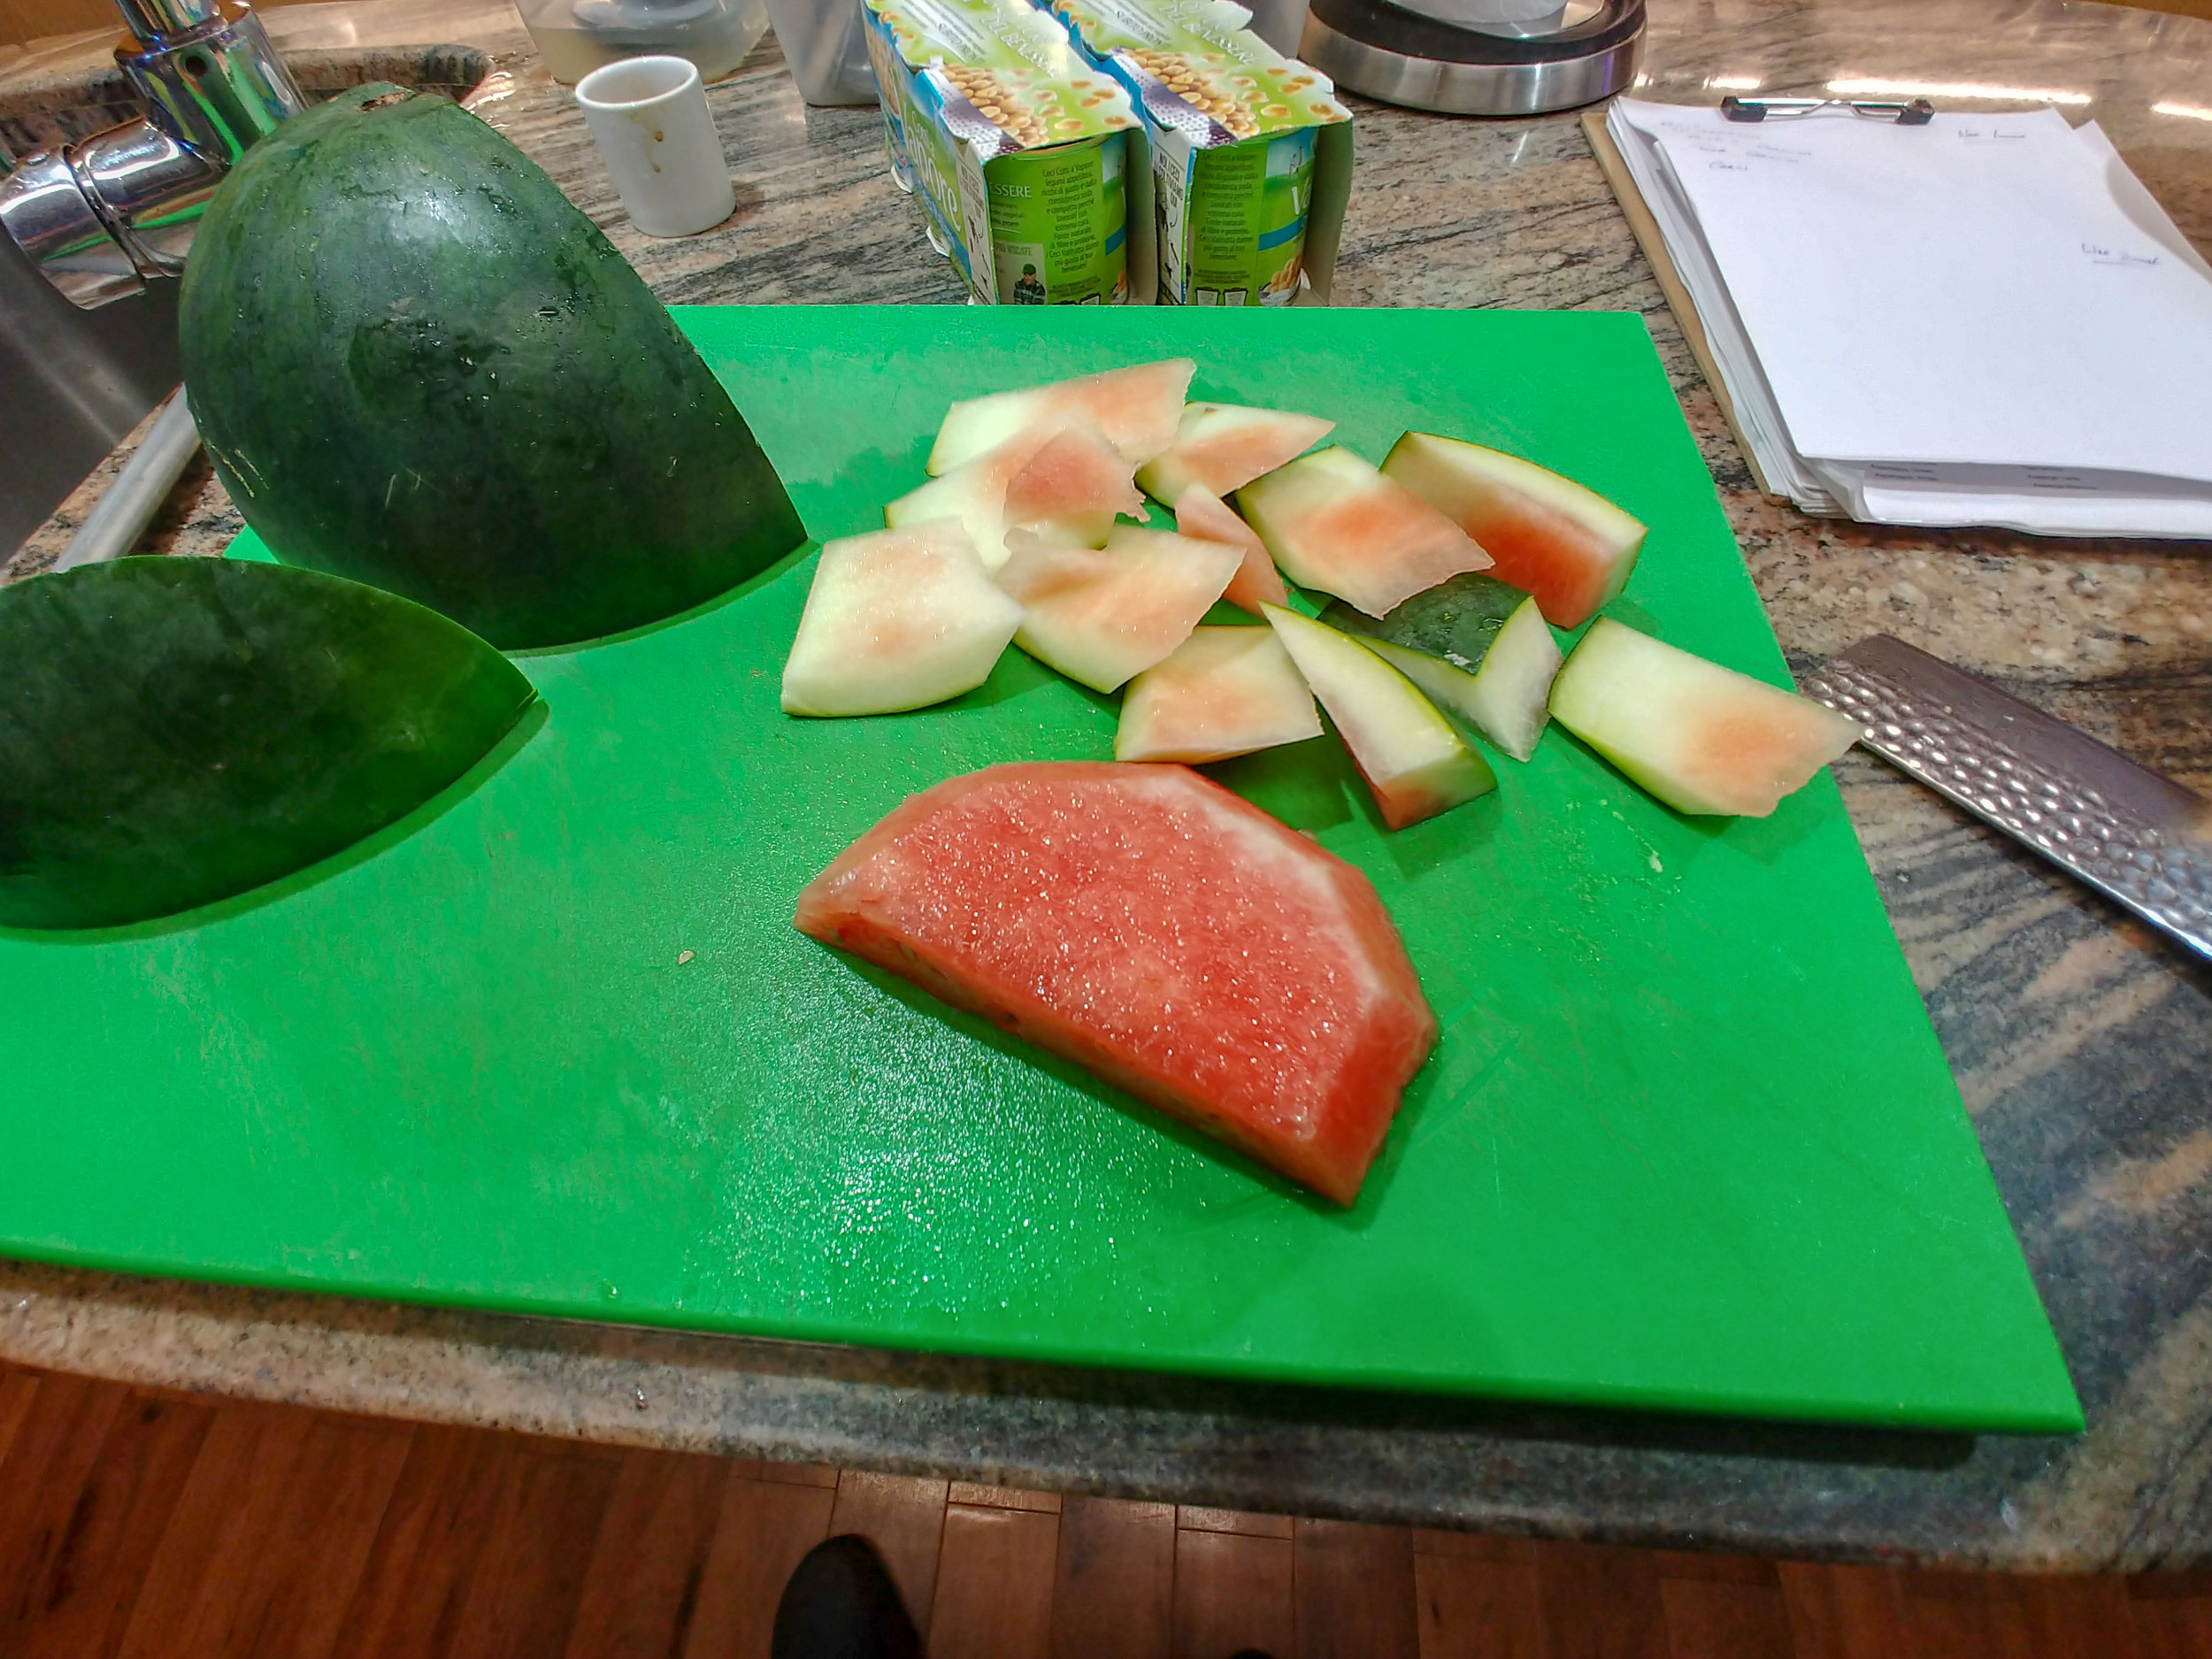 Peel - the watermelon